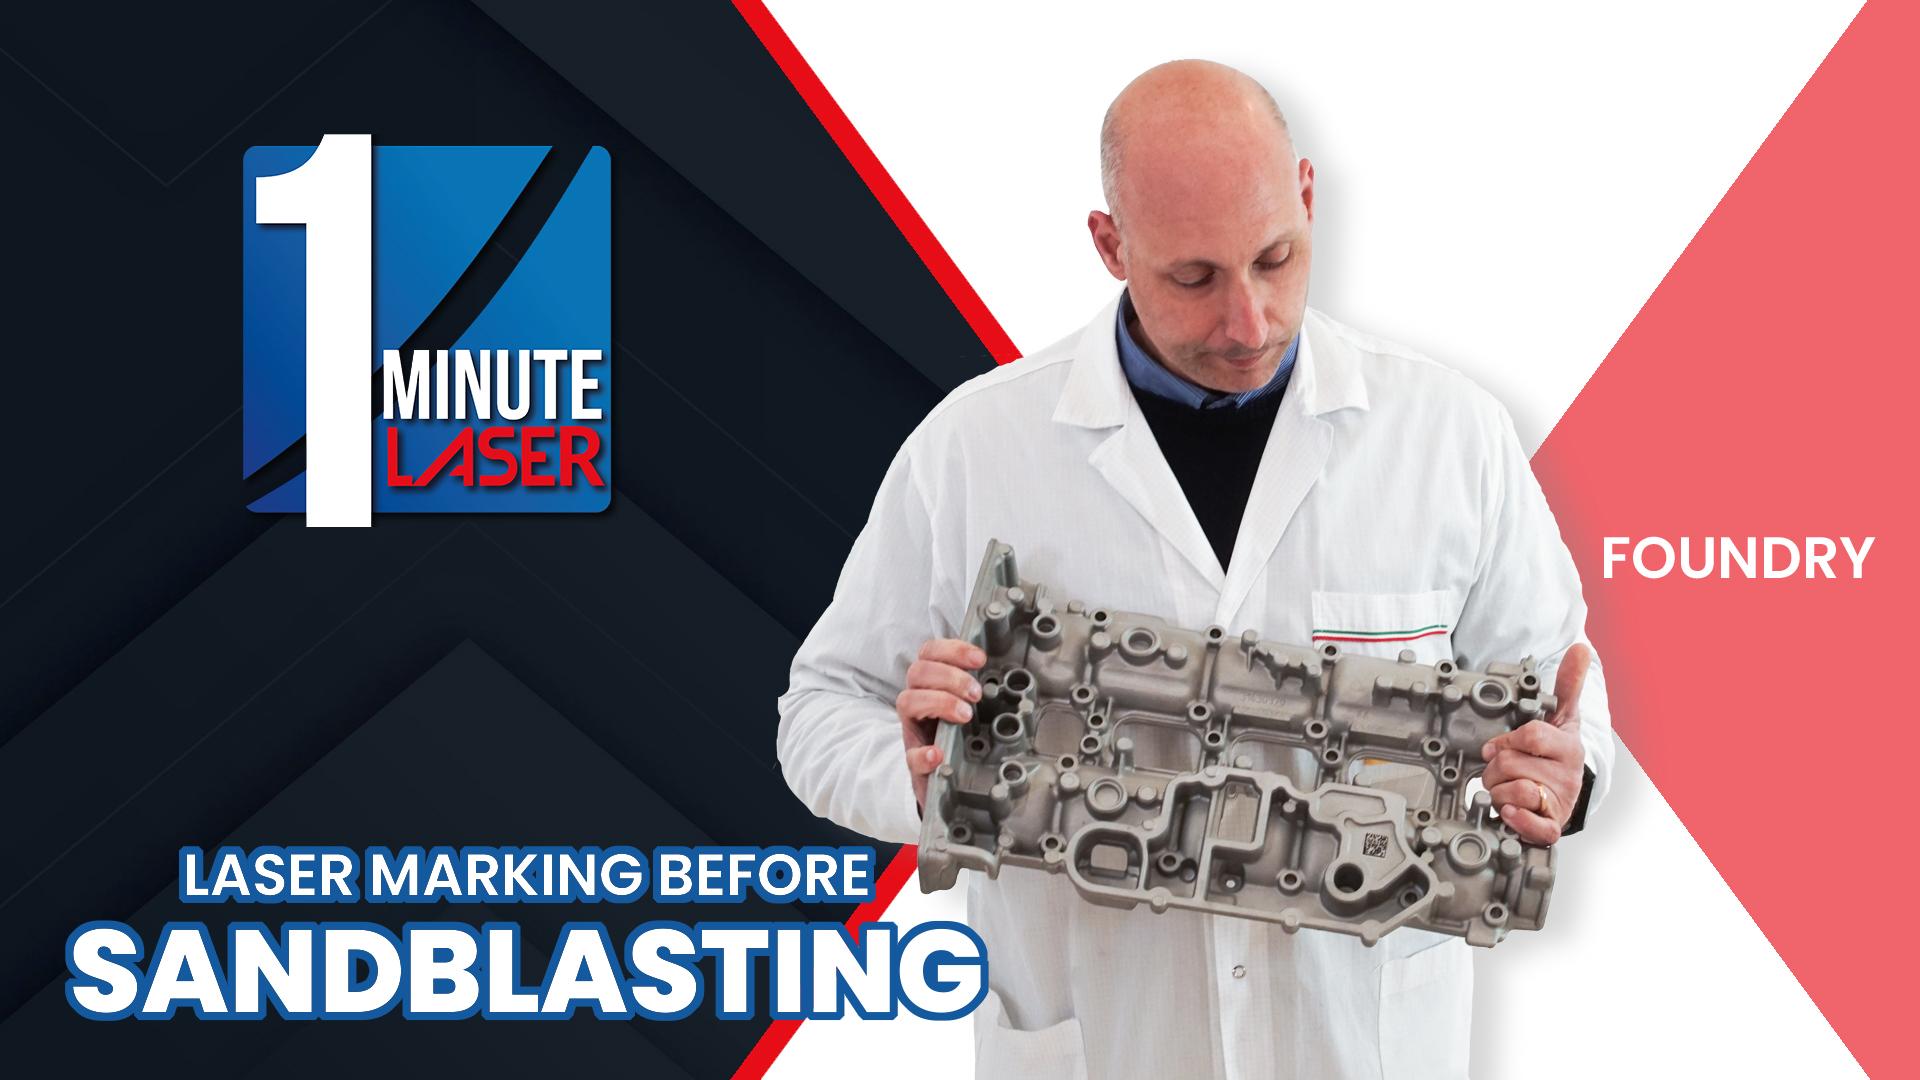 One-Minute-Laser-4-Sandblasting_COPERTINA Fonderia